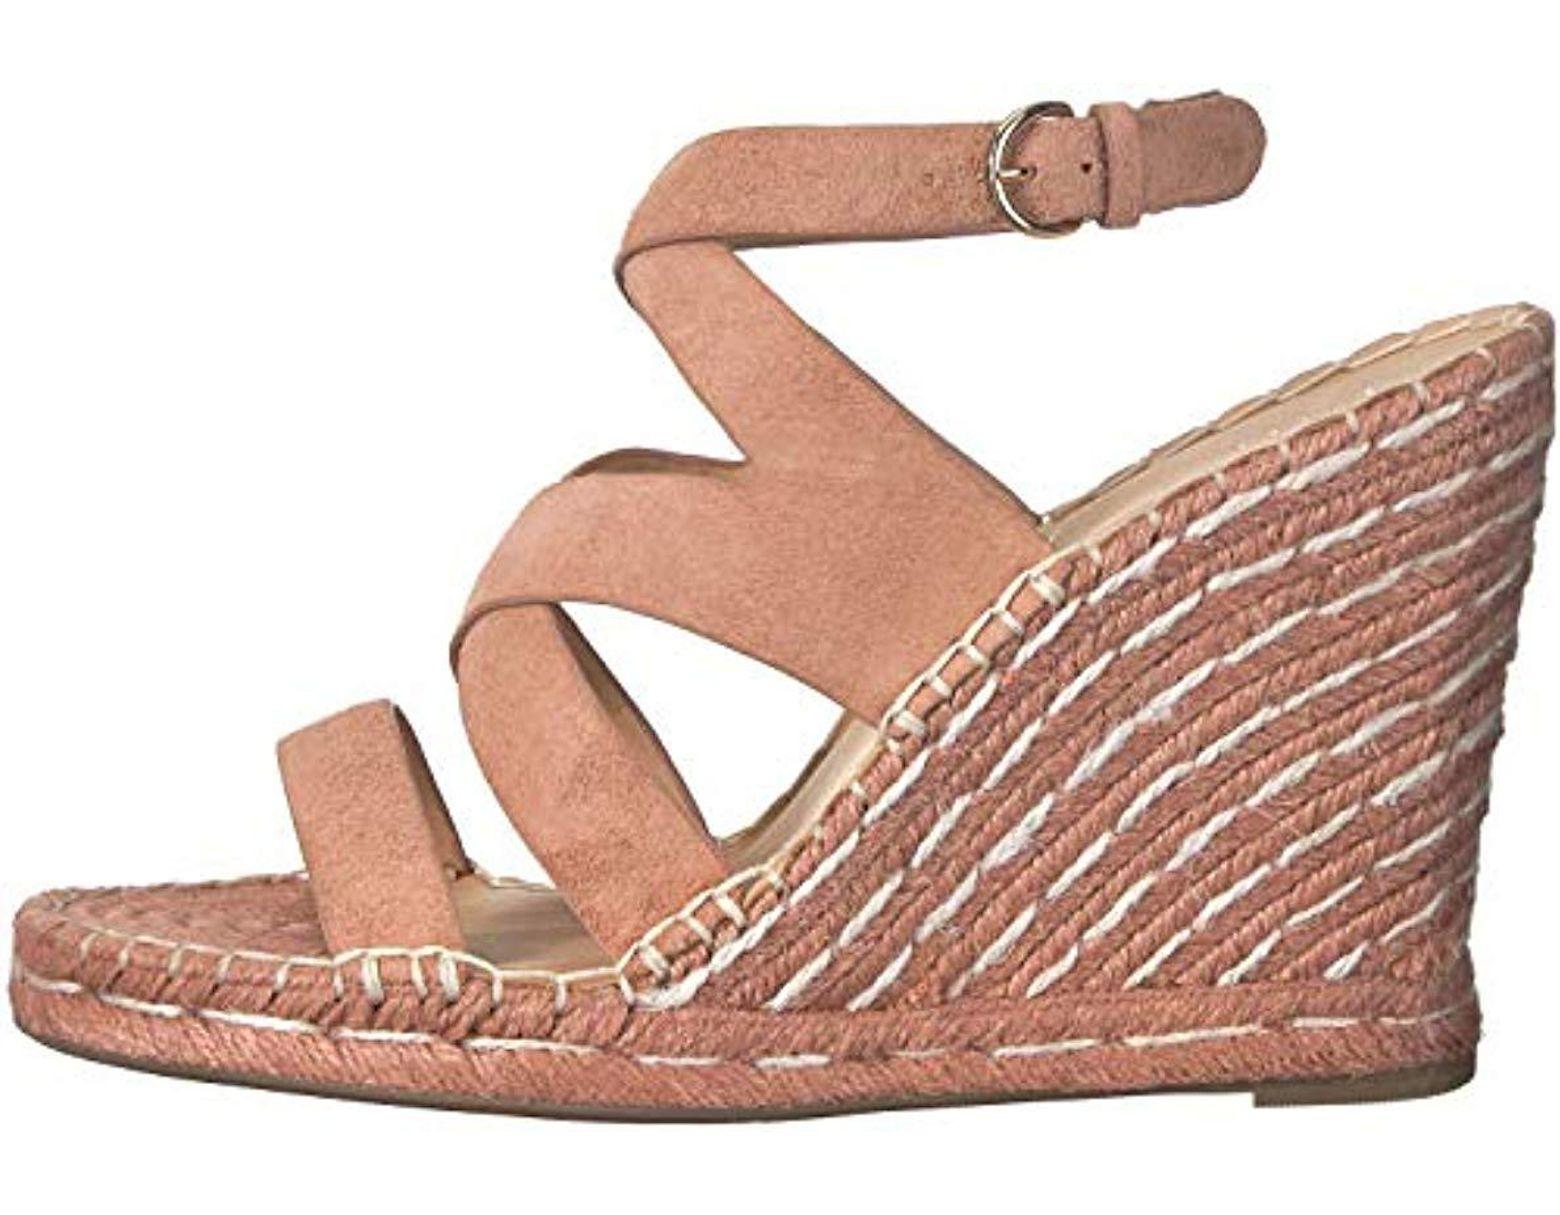 c1bd2b17b9d Women's Korrat Espadrille Wedge Sandal, Peach, 39 Regular Eu (9 Us)